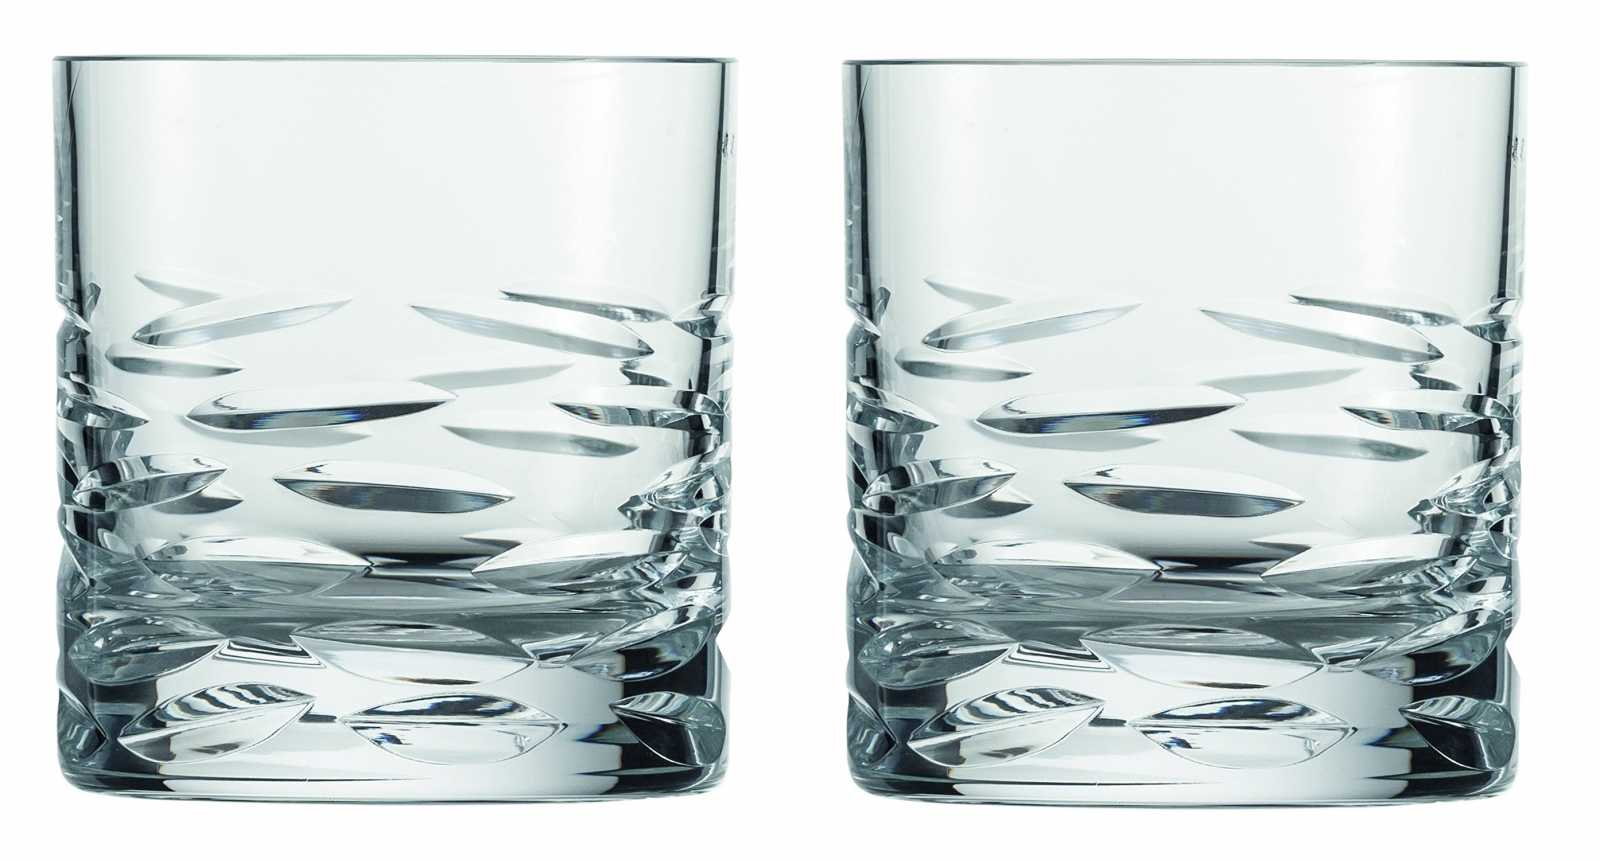 Онлайн каталог PROMENU: набор стаканов для виски 0,369 л, 2 шт.                               119656